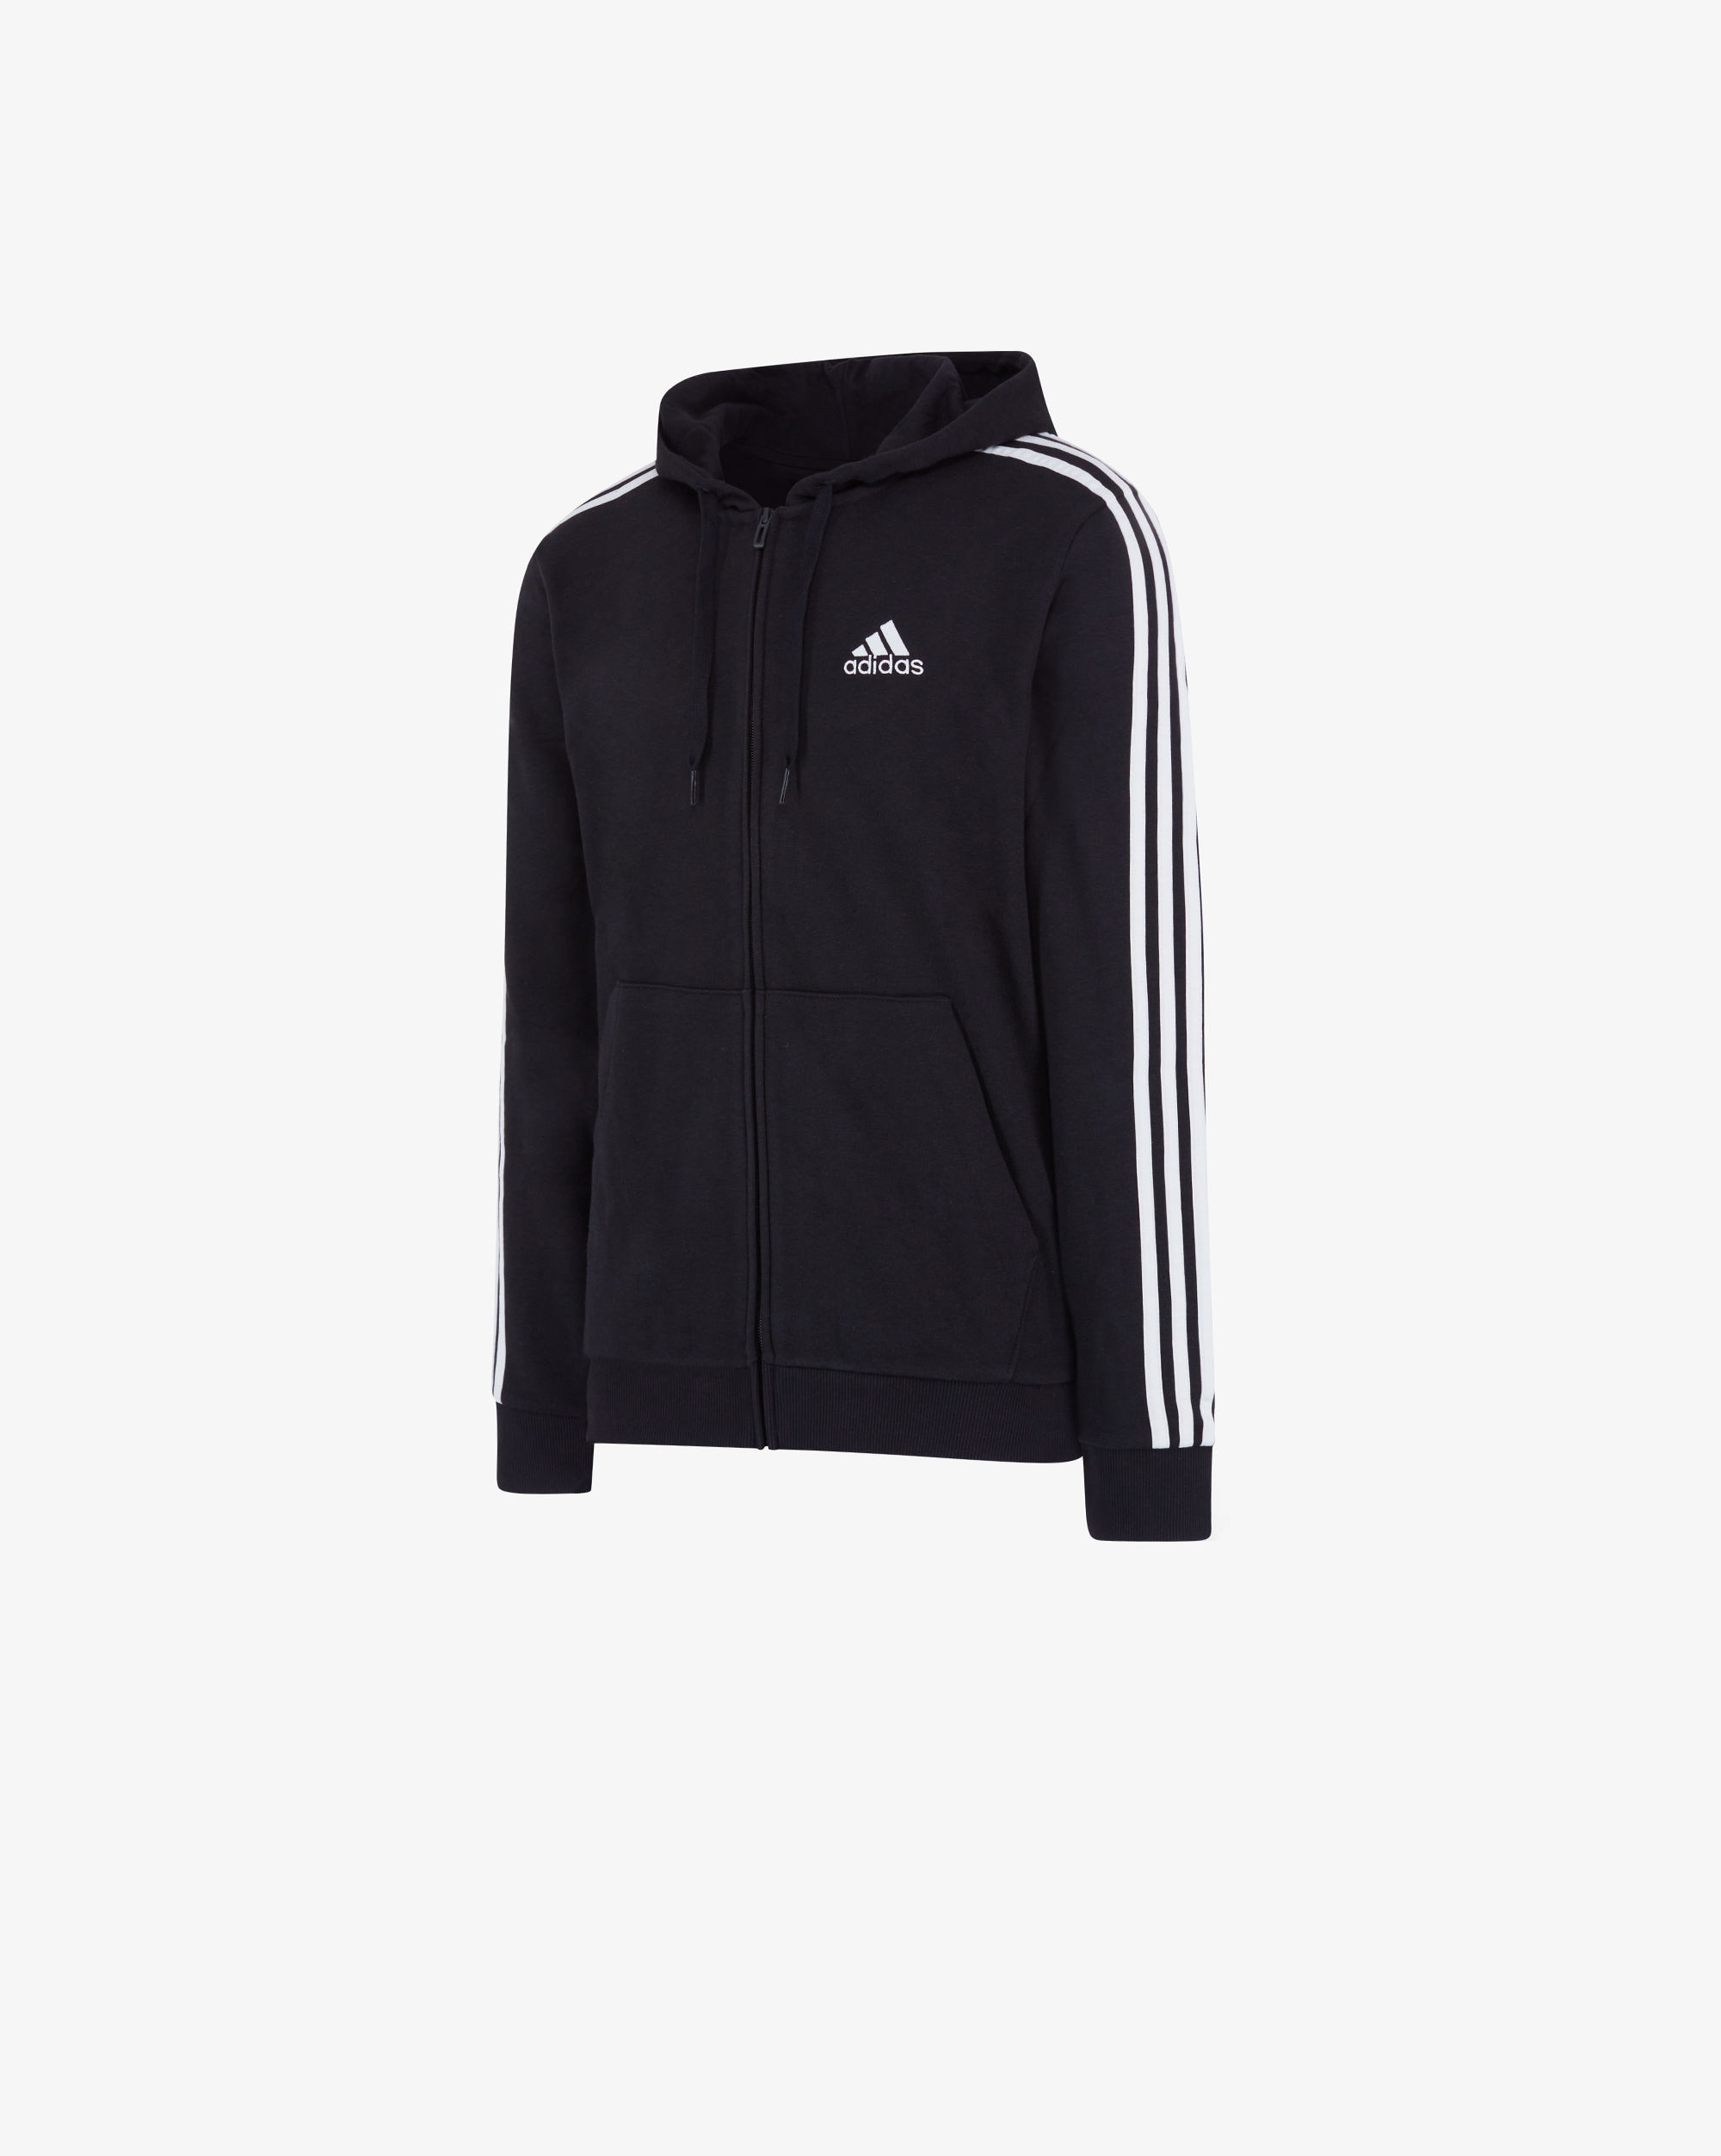 Adidas Felpa Essentials French Terry 3-Stripes Full|Zip Uomo